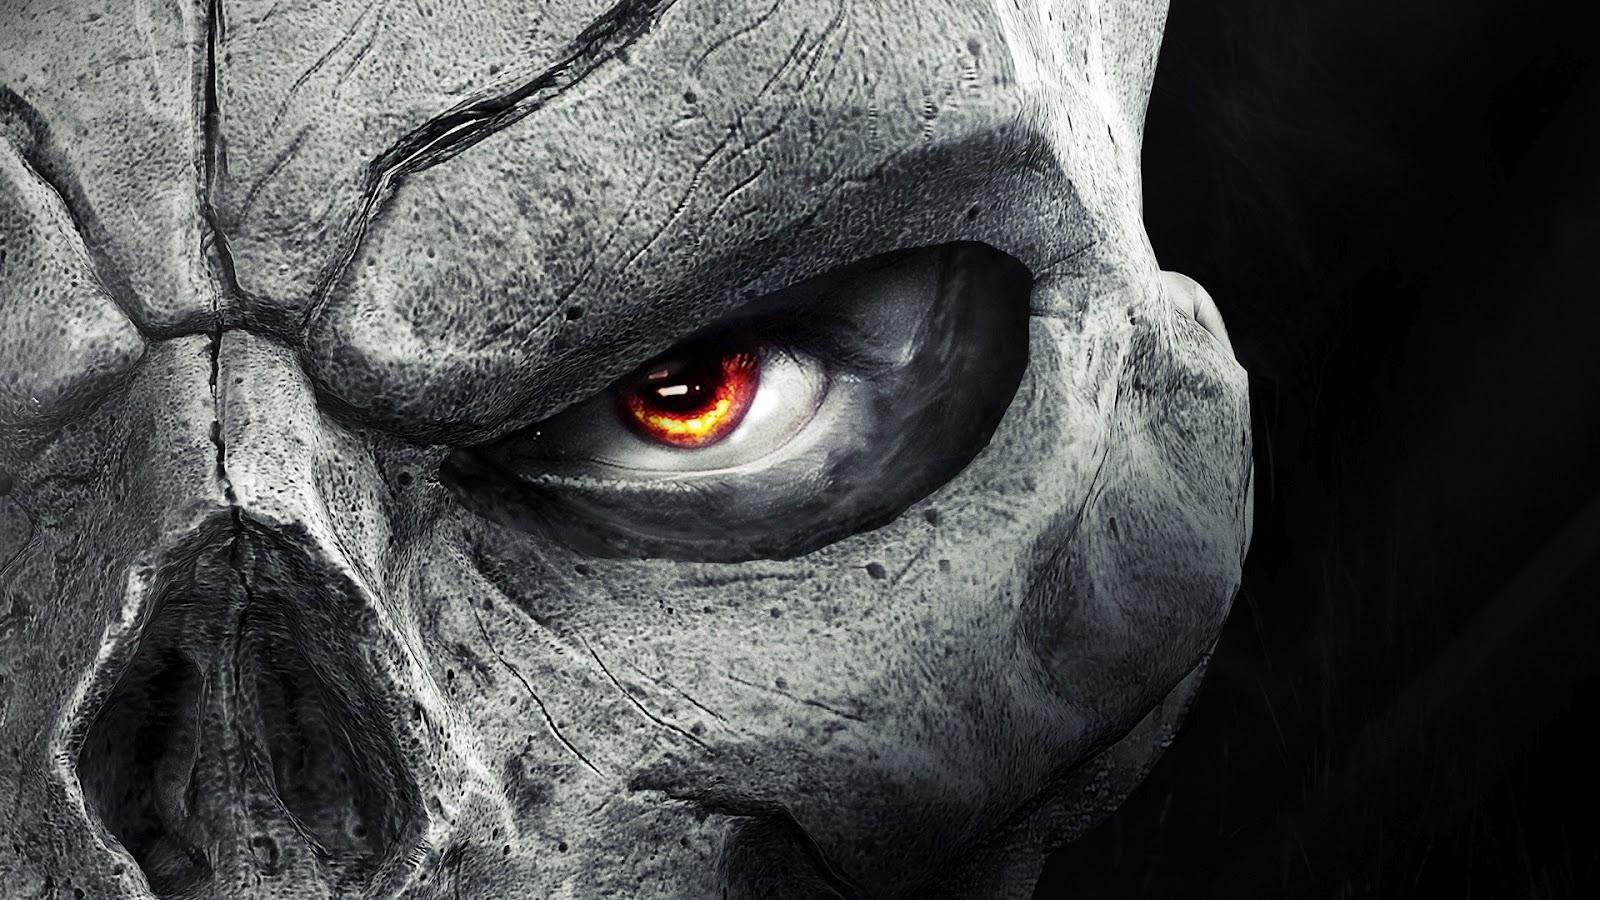 Darksider 2 Skull MasK Flaming Eyes Grey HD Wallpaper GWb